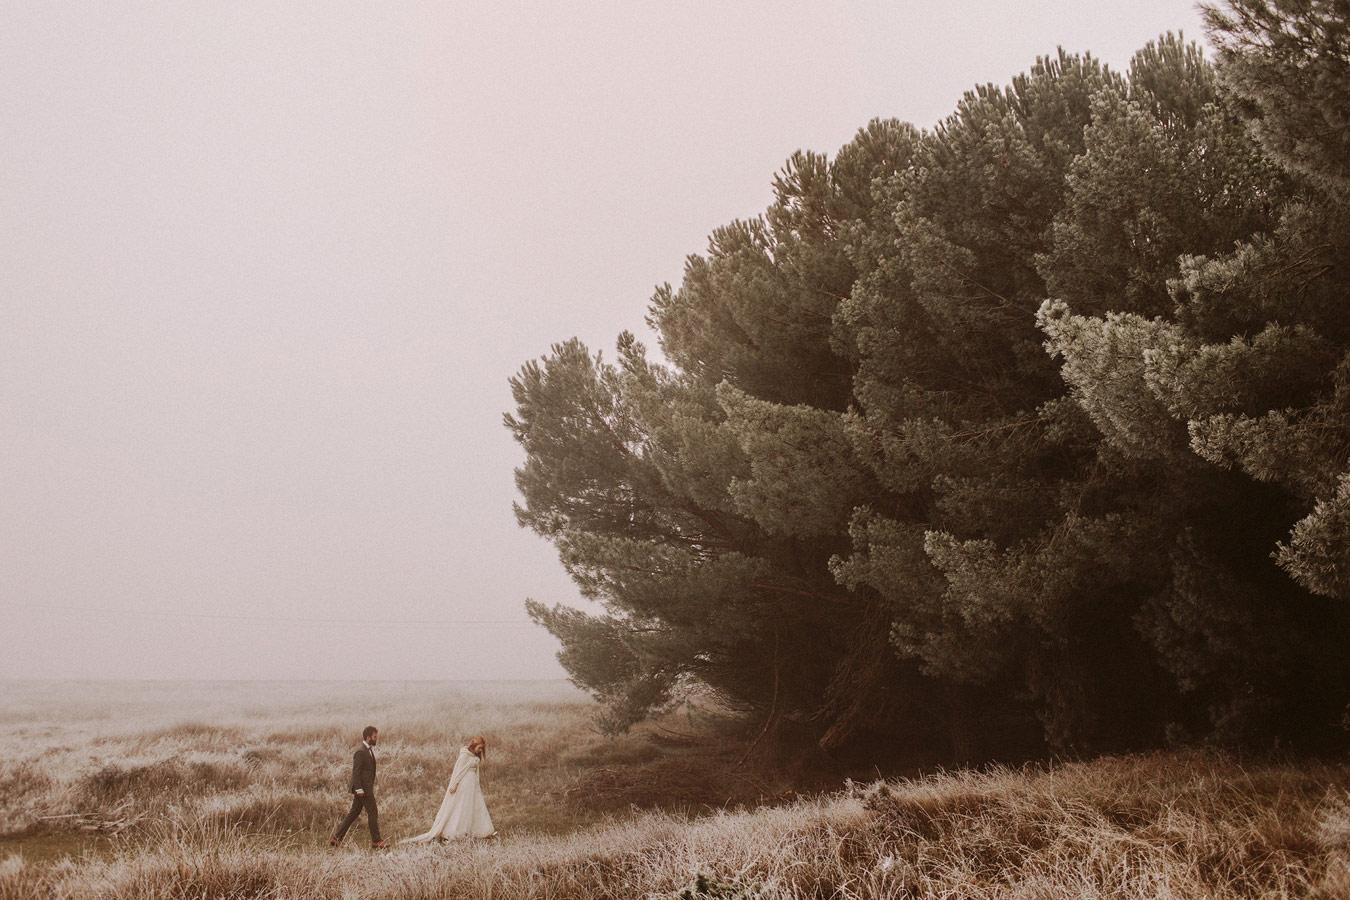 Сказочный туман, © Даниэль Алонсо / Daniel Alonso, Миранда де Эбро, Бургос, Испания, Фотоконкурс «Rangefinder Ежегодник»